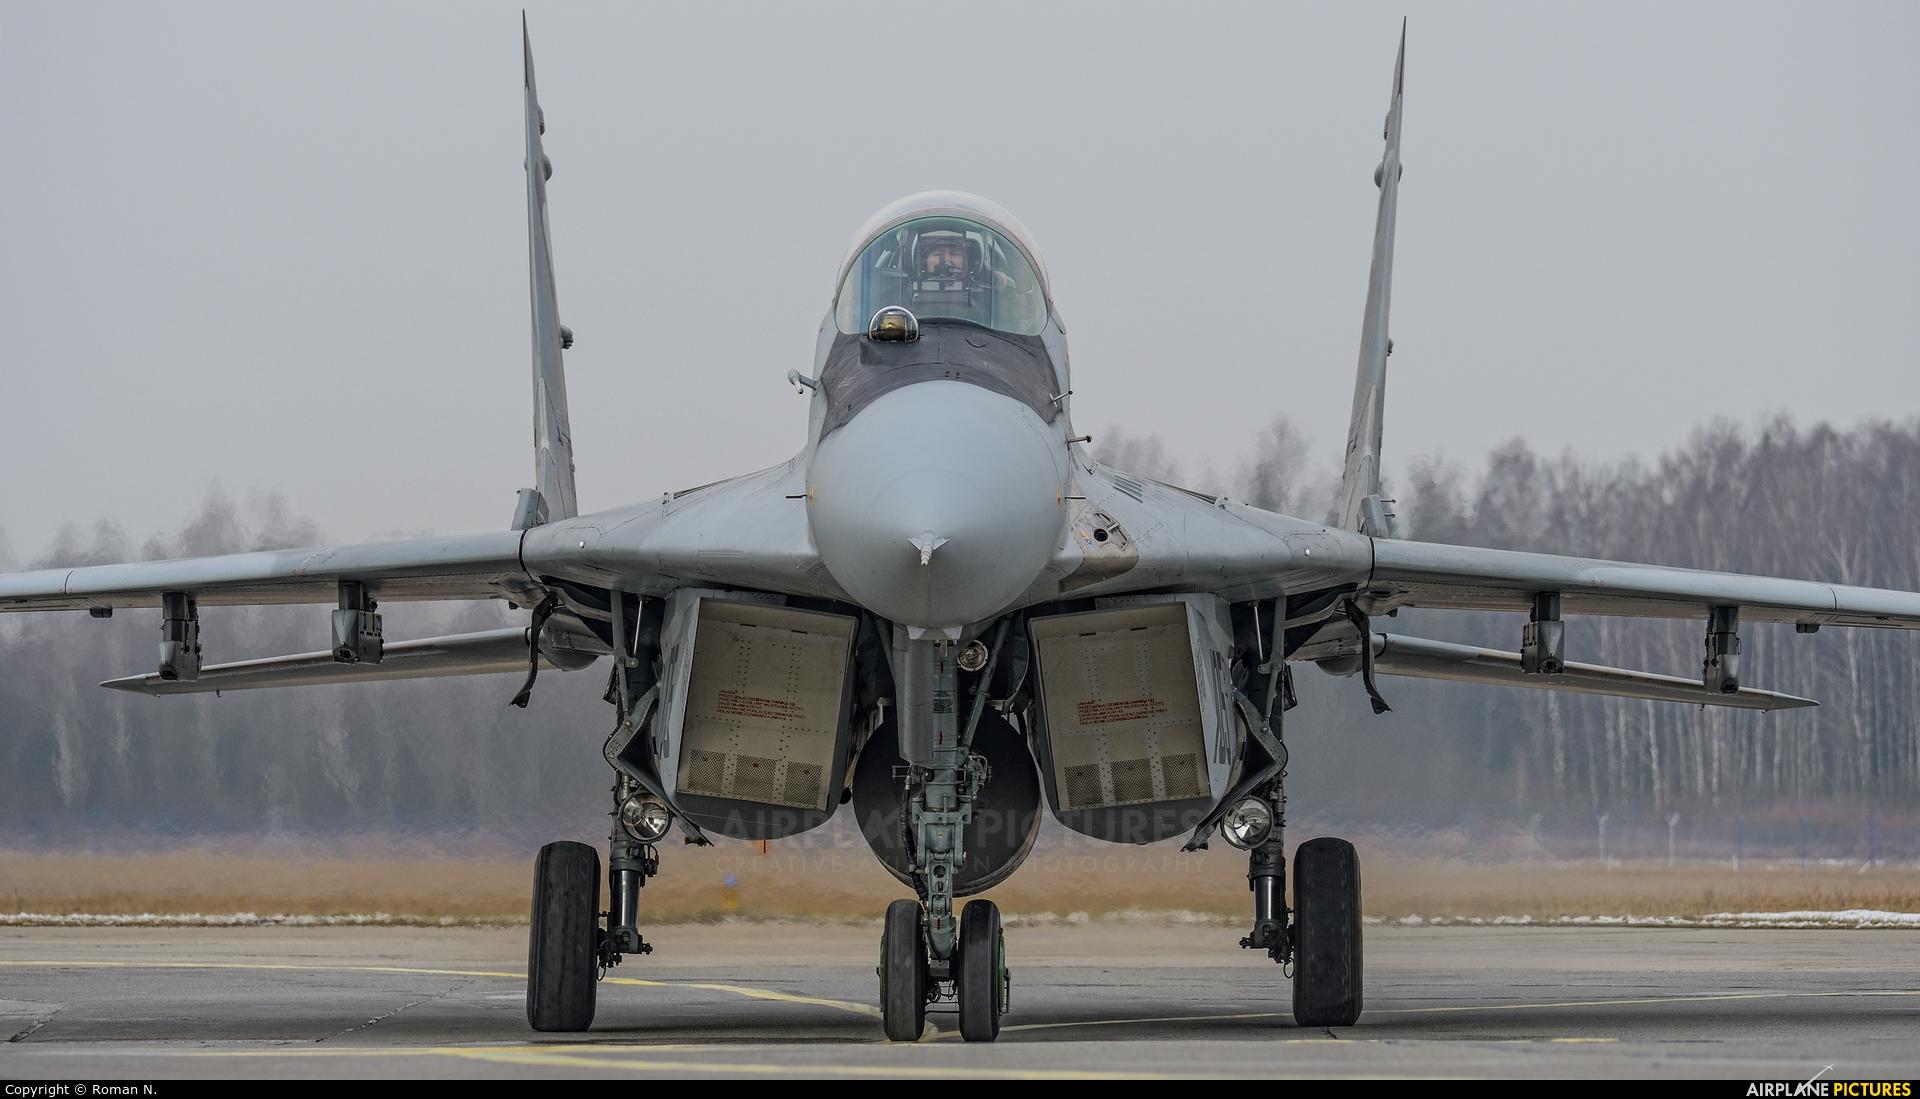 Poland - Air Force 105 aircraft at Mińsk Mazowiecki